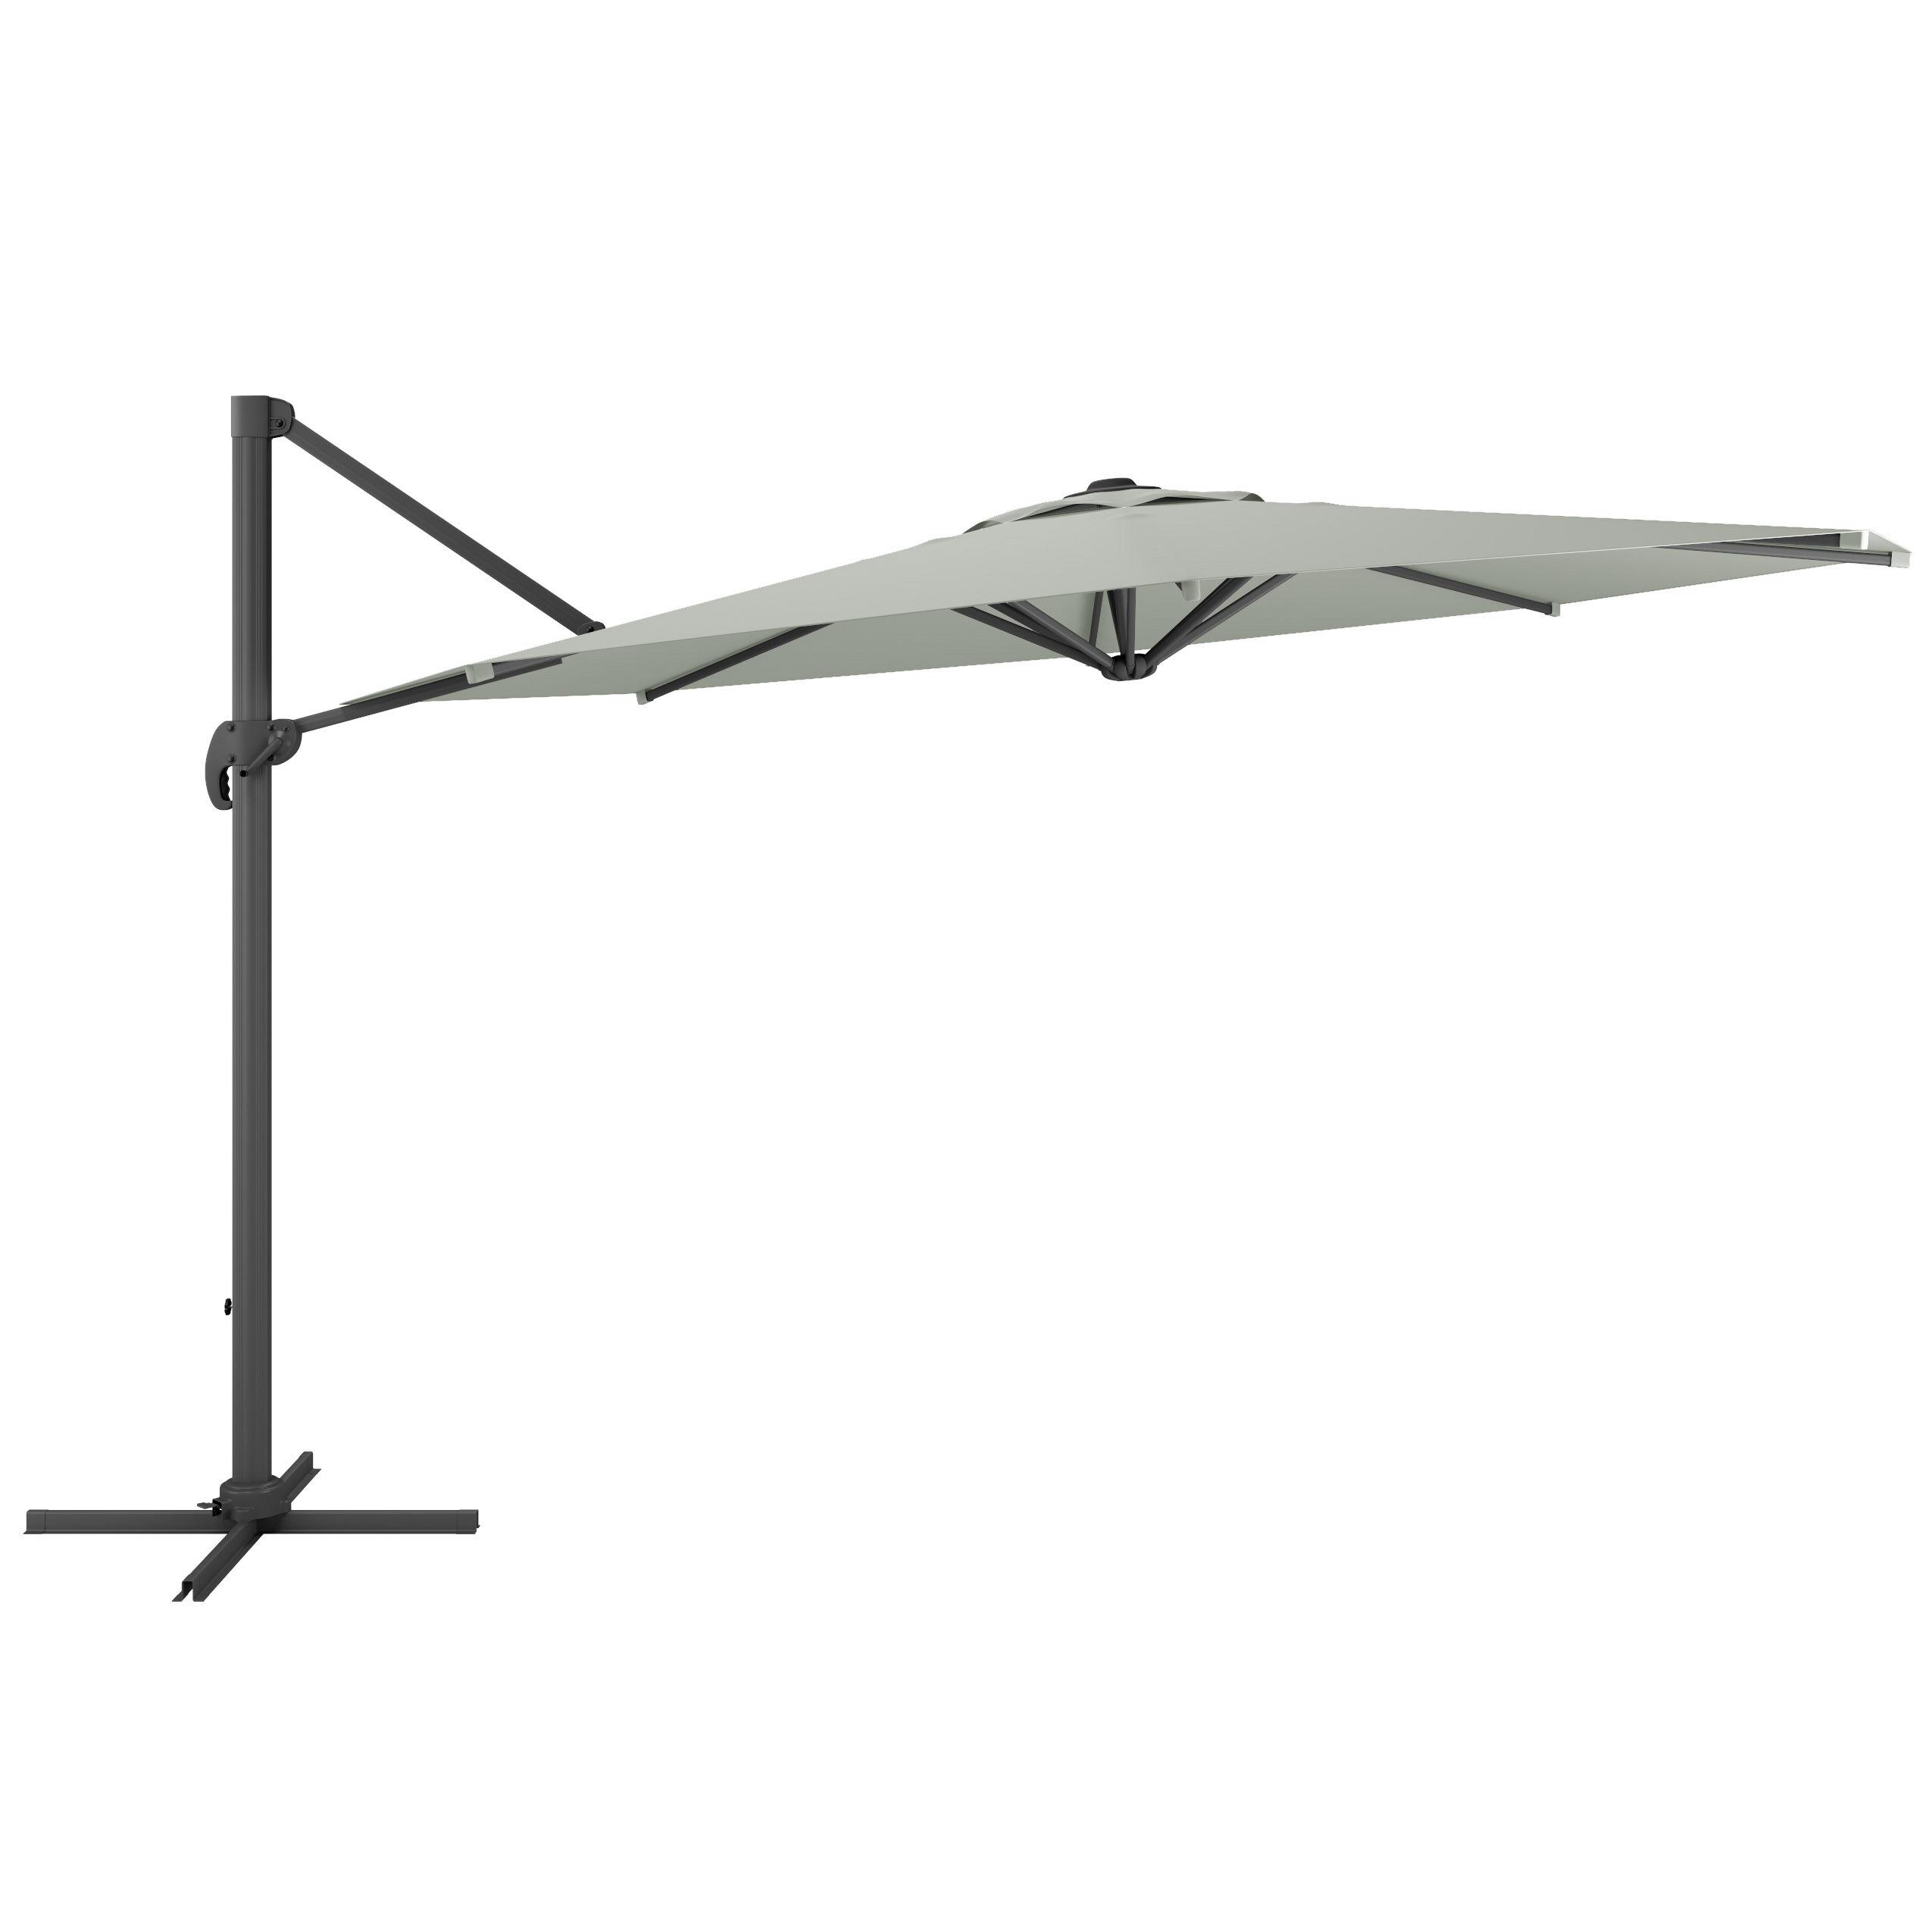 sc 1 st  AllModern & Reid 11u0027 Cantilever Umbrella u0026 Reviews | AllModern